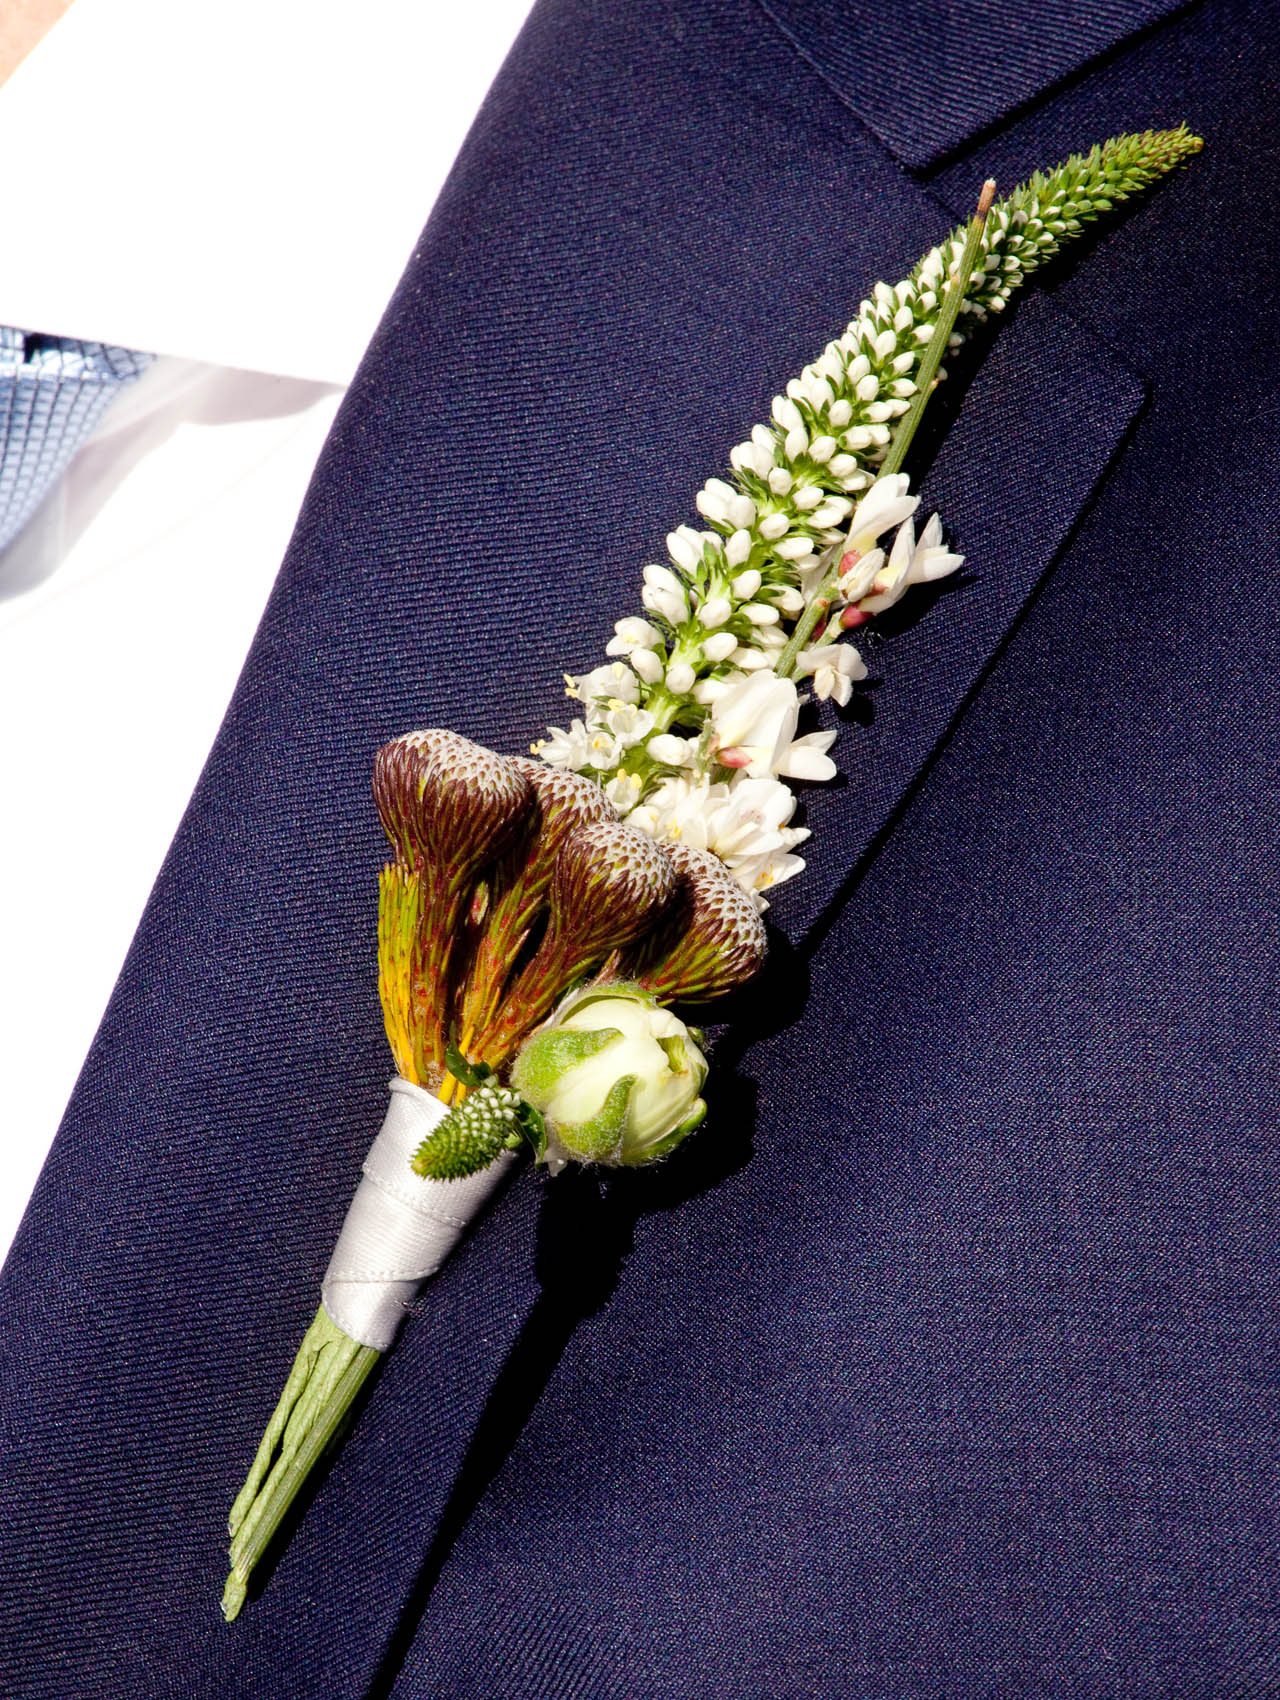 ChristopherWhite_Jordan_wedding_5.jpg